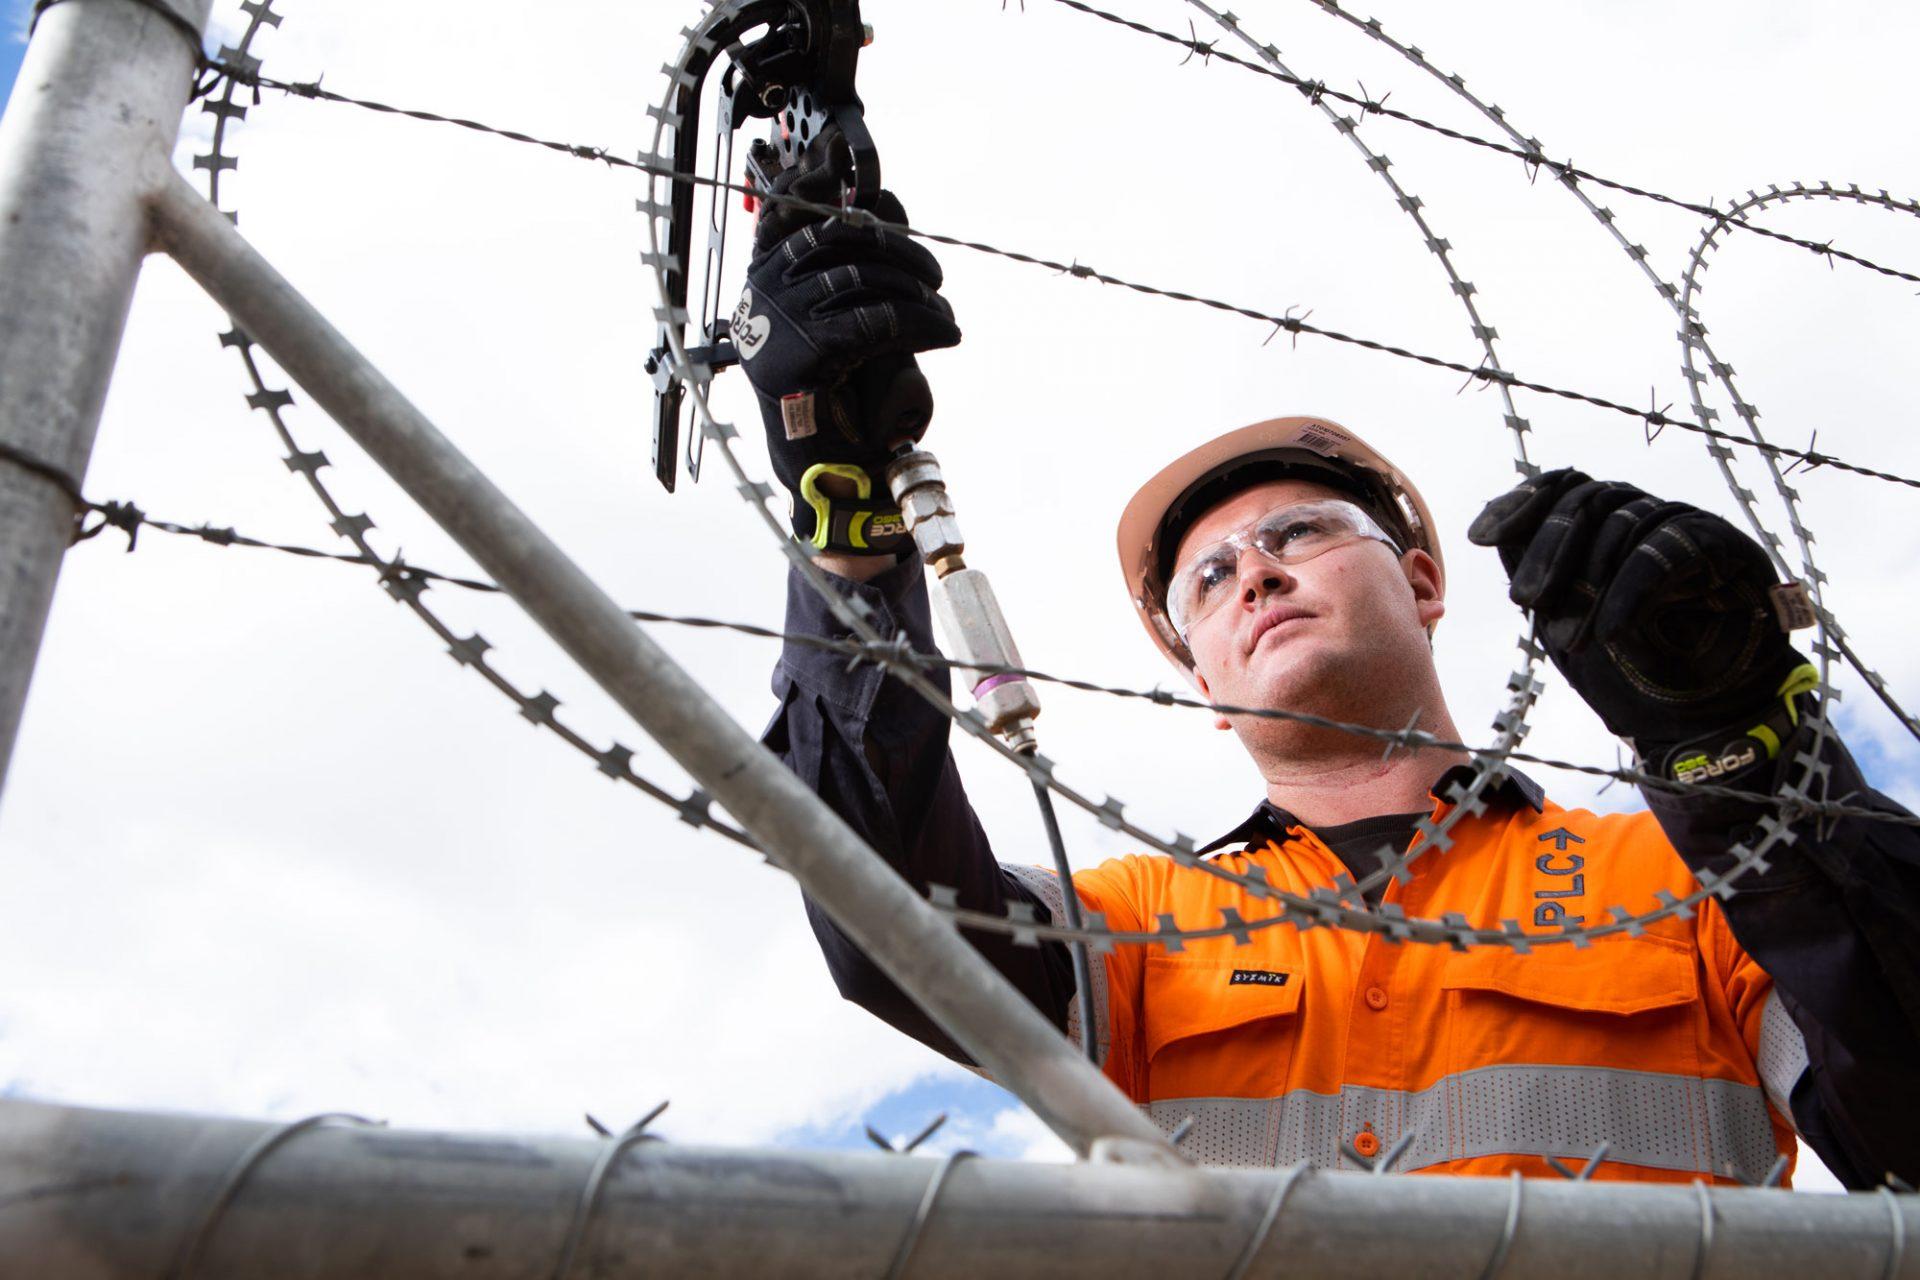 PLC worker installs security razor wire.